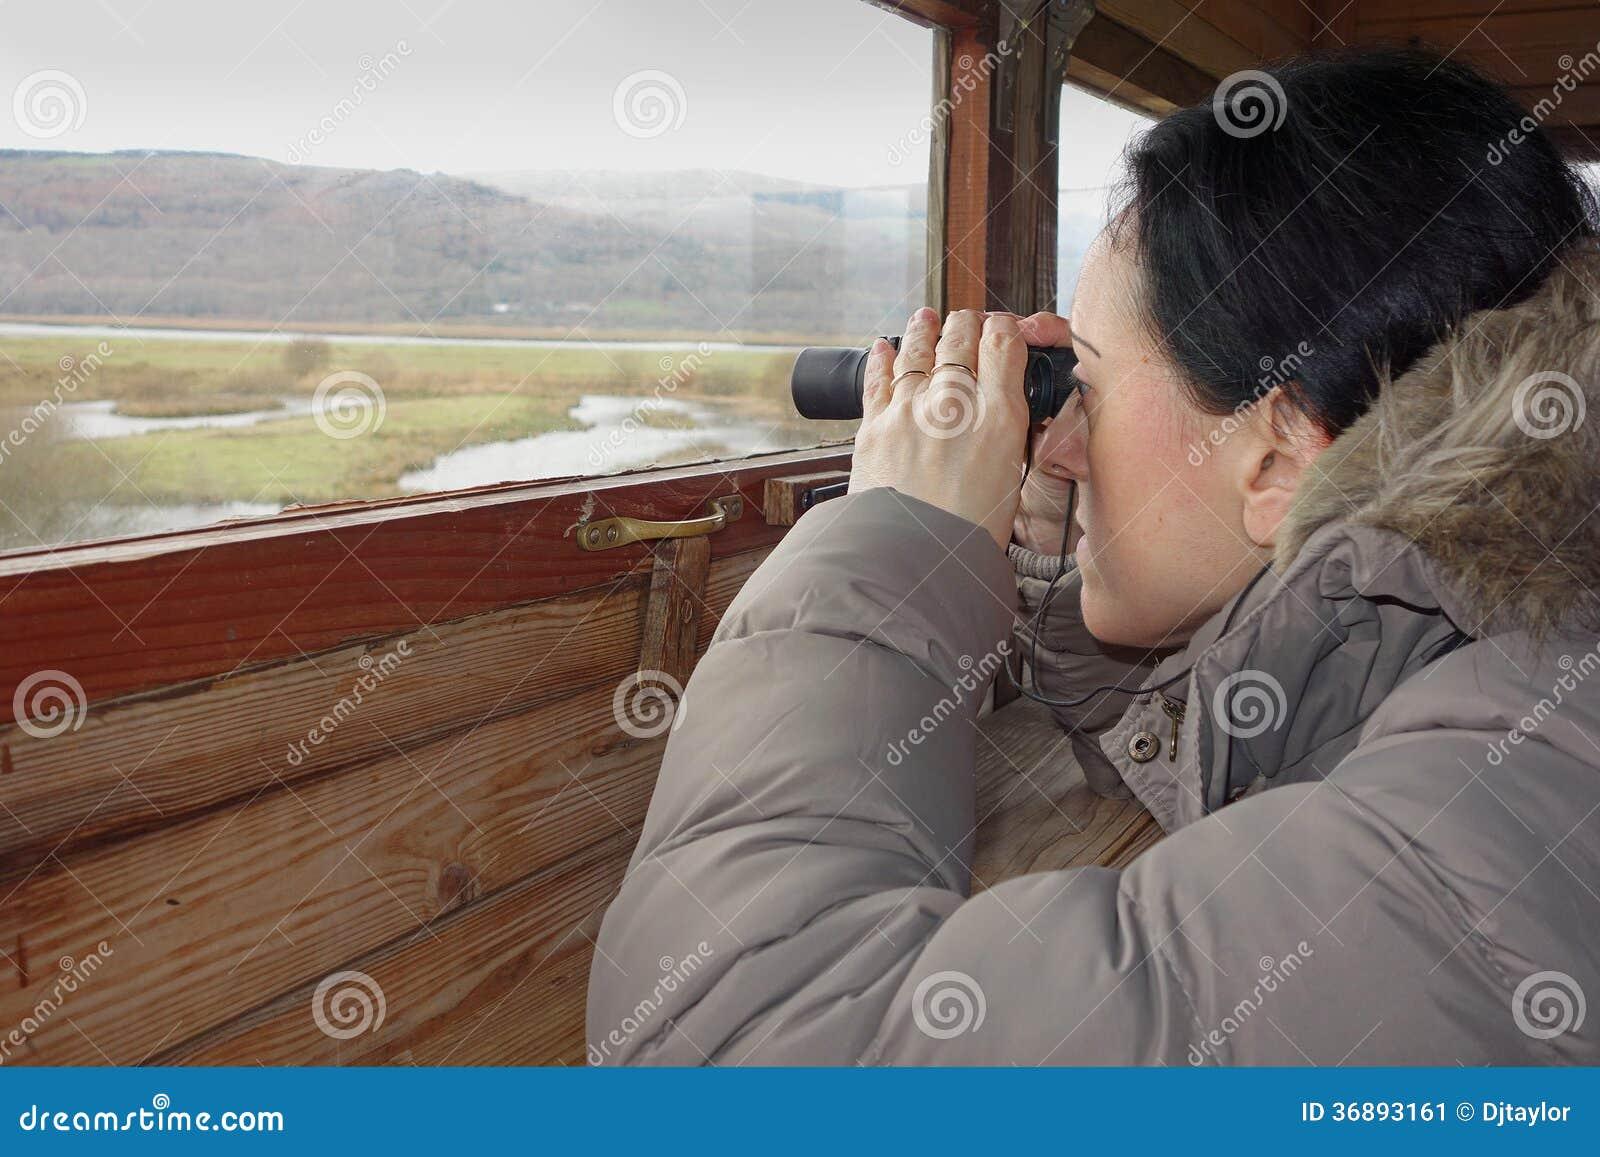 Download Birdwatching immagine stock. Immagine di uccello, tenuta - 36893161